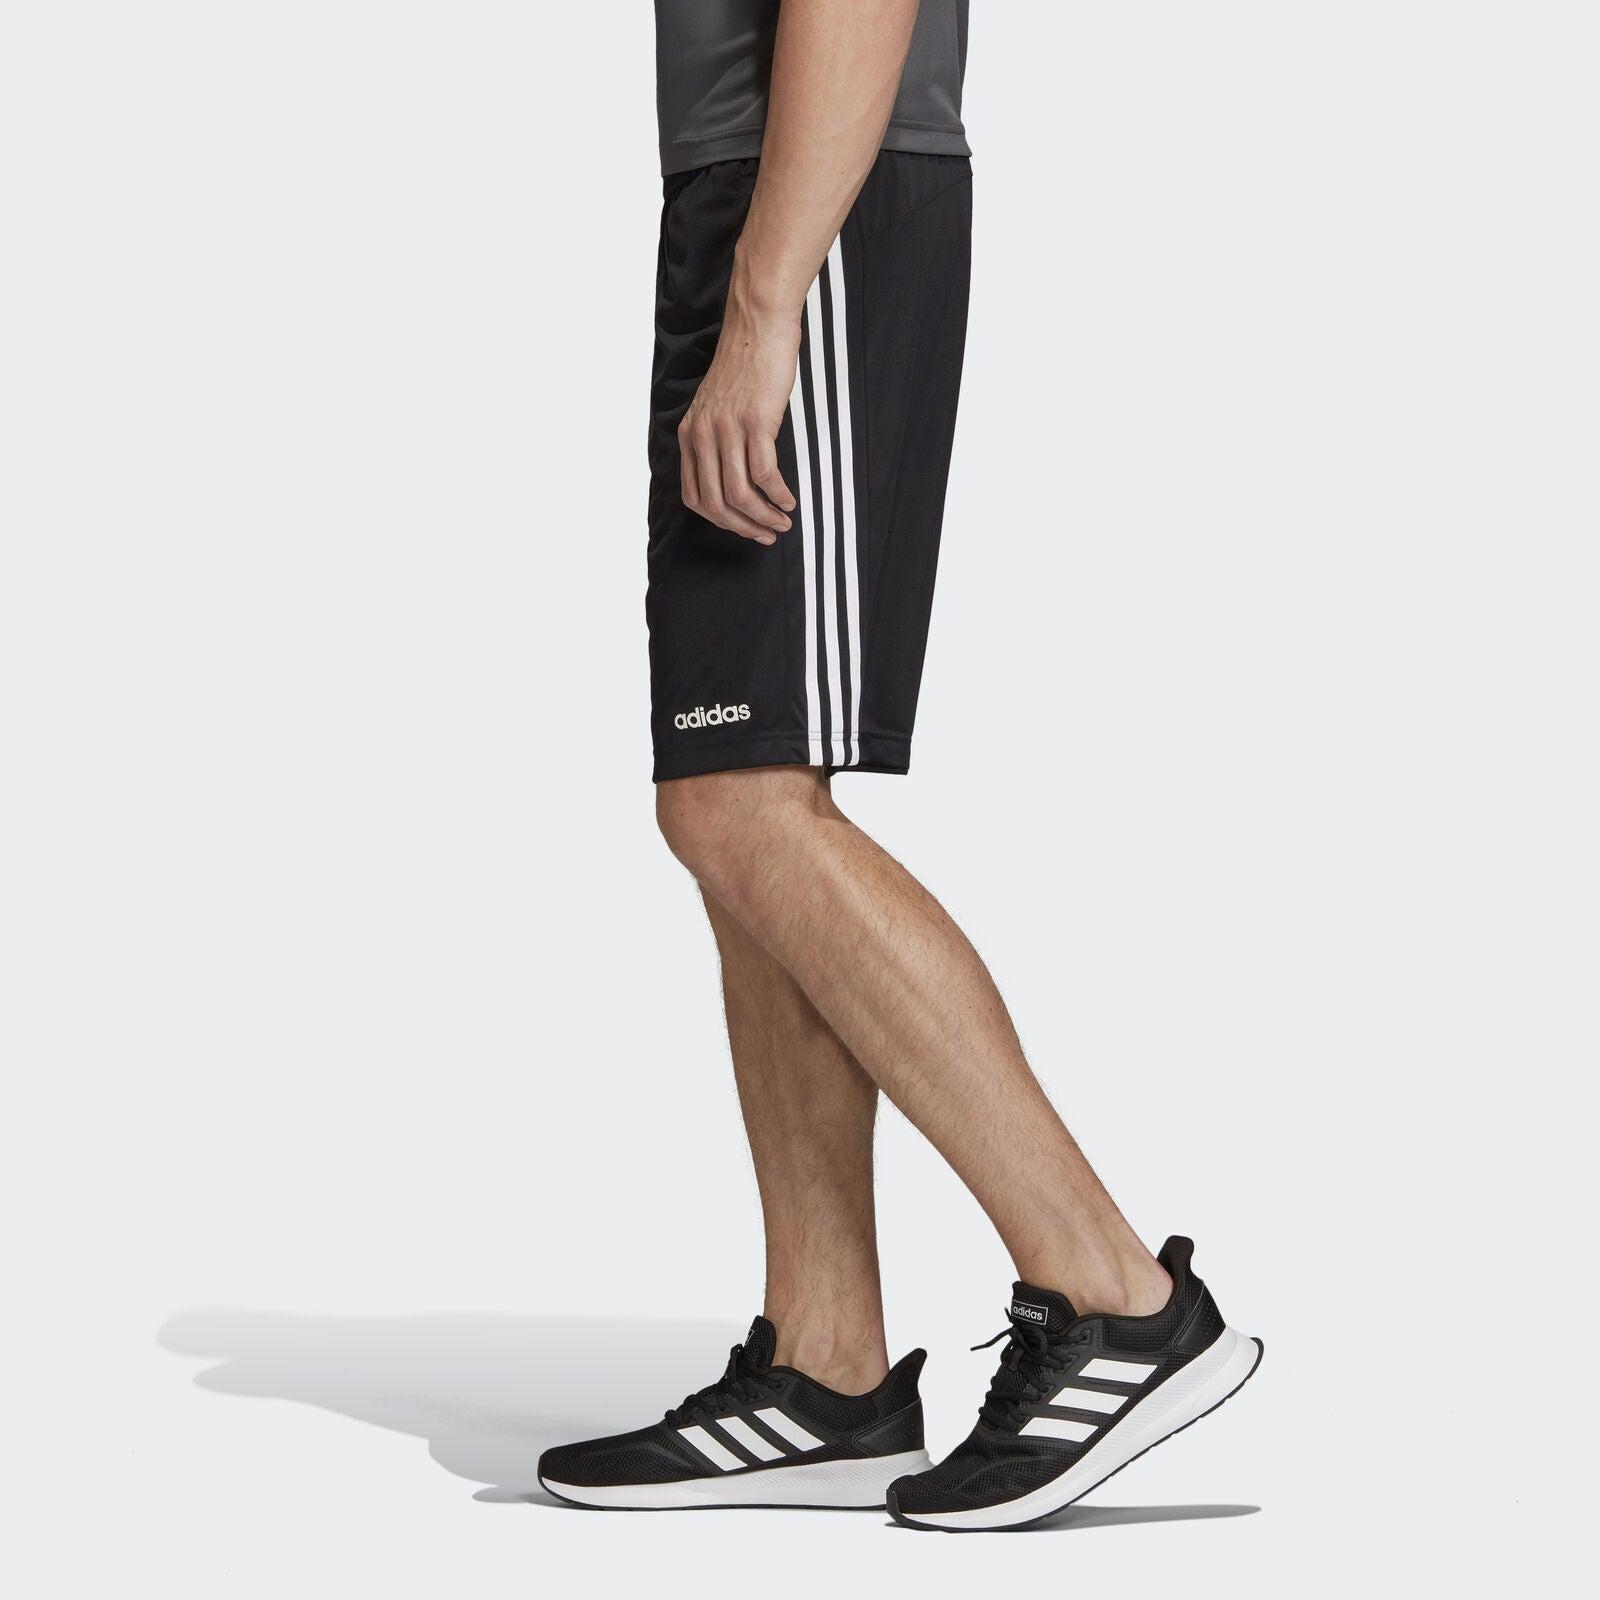 adidas: Women's Tiro 19 Pants 2 for $34.50, Men's Climacool 3-Stripes Shorts